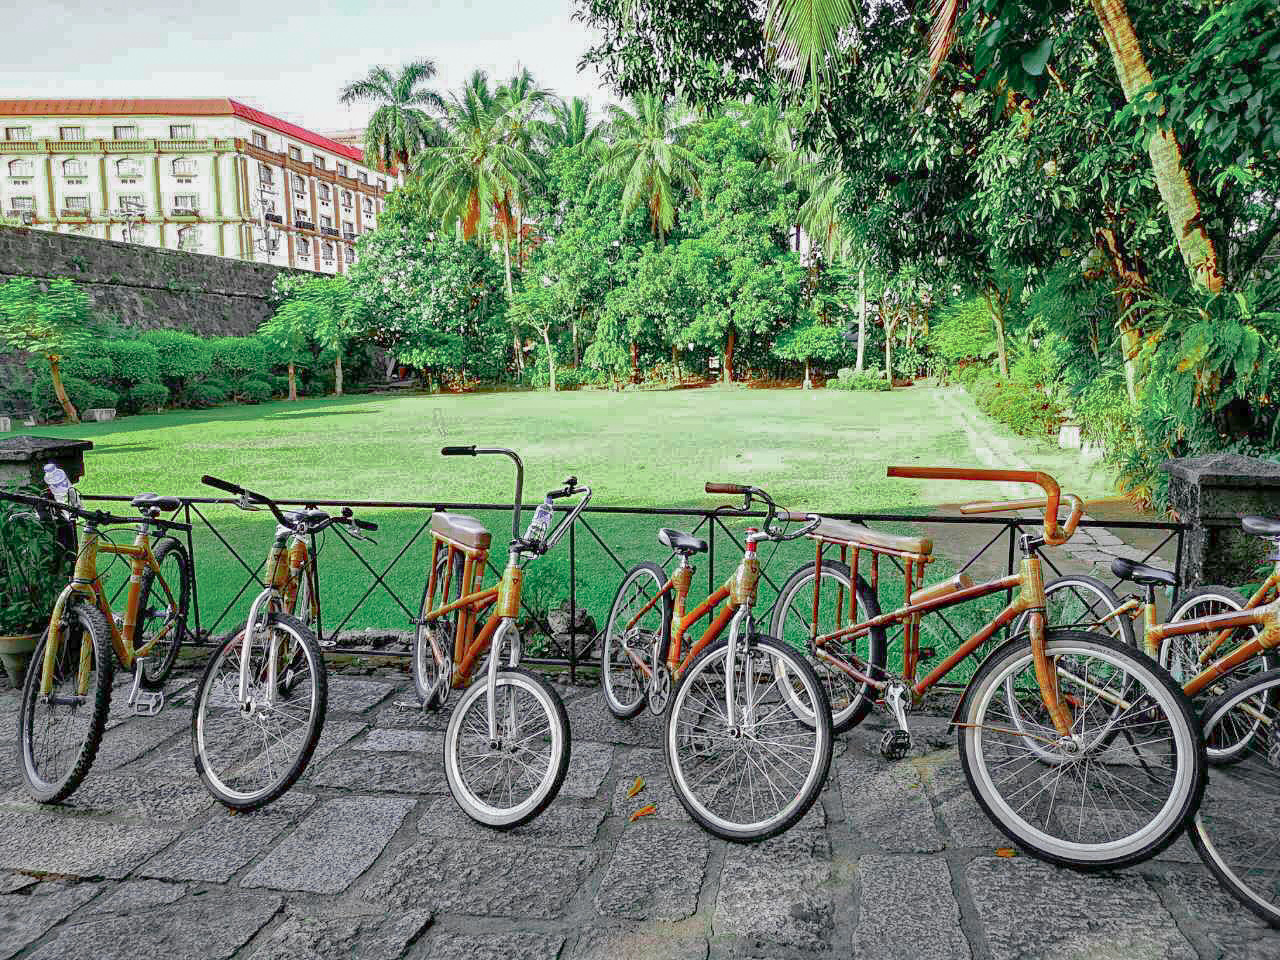 Manila Intramuros Historical Tour in Eco-Friendly Bamboo Bike